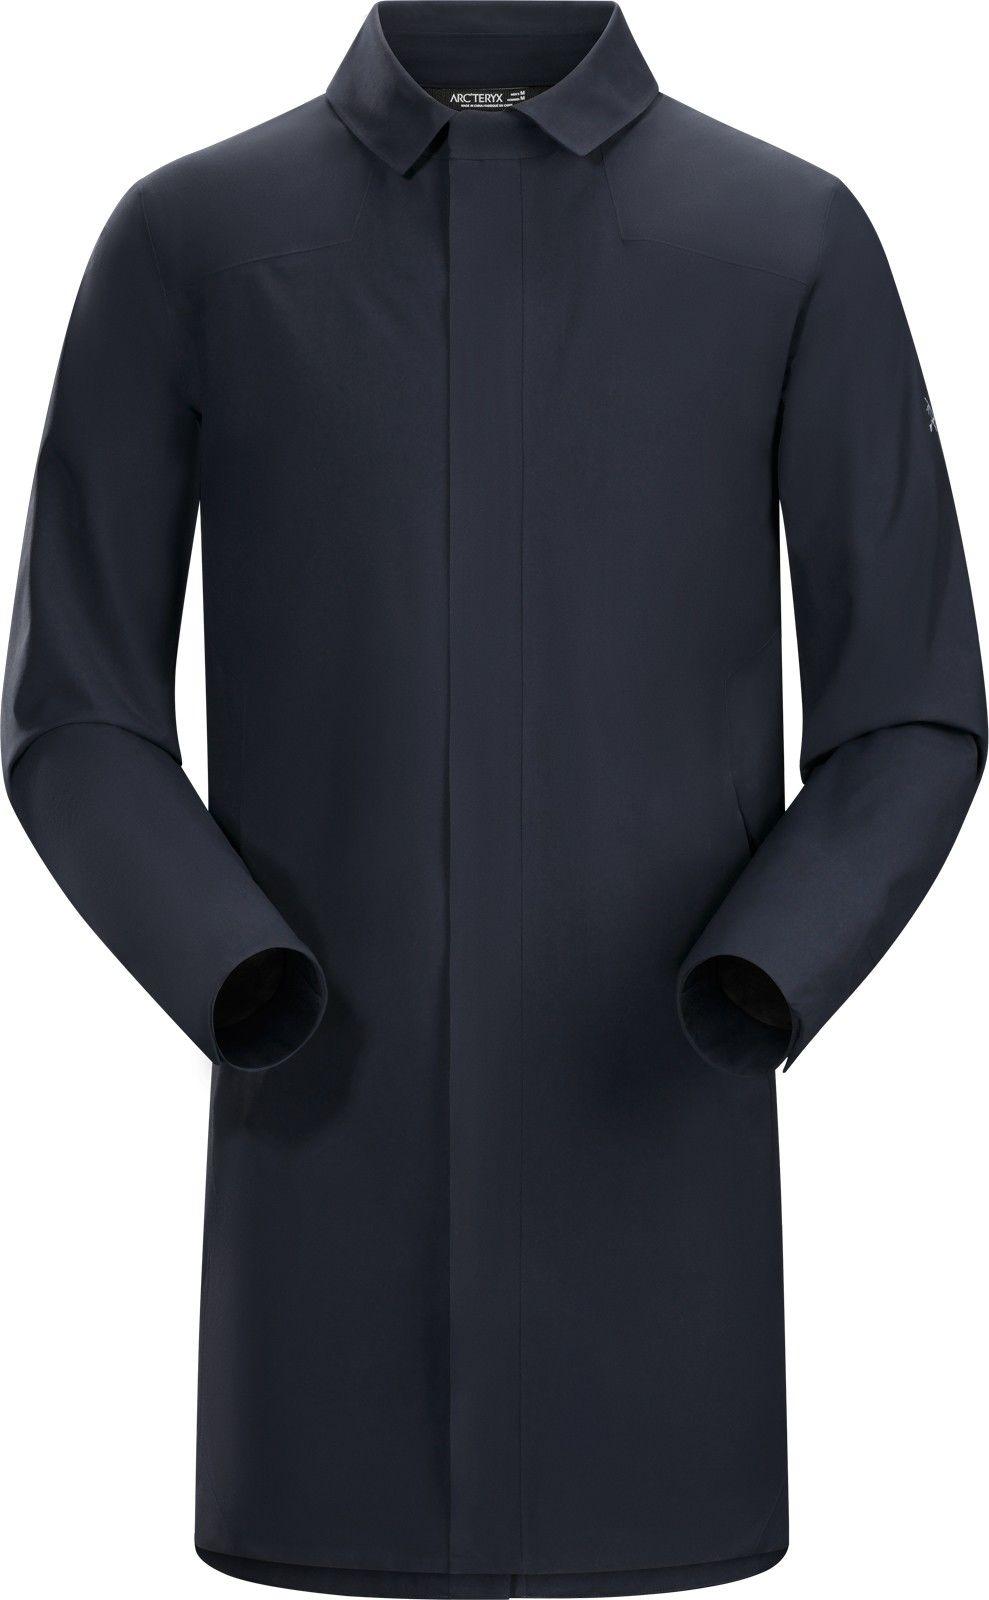 Arcteryx Keppel Trench Coat Blau, Male Gore-Tex® Freizeitmantel, L